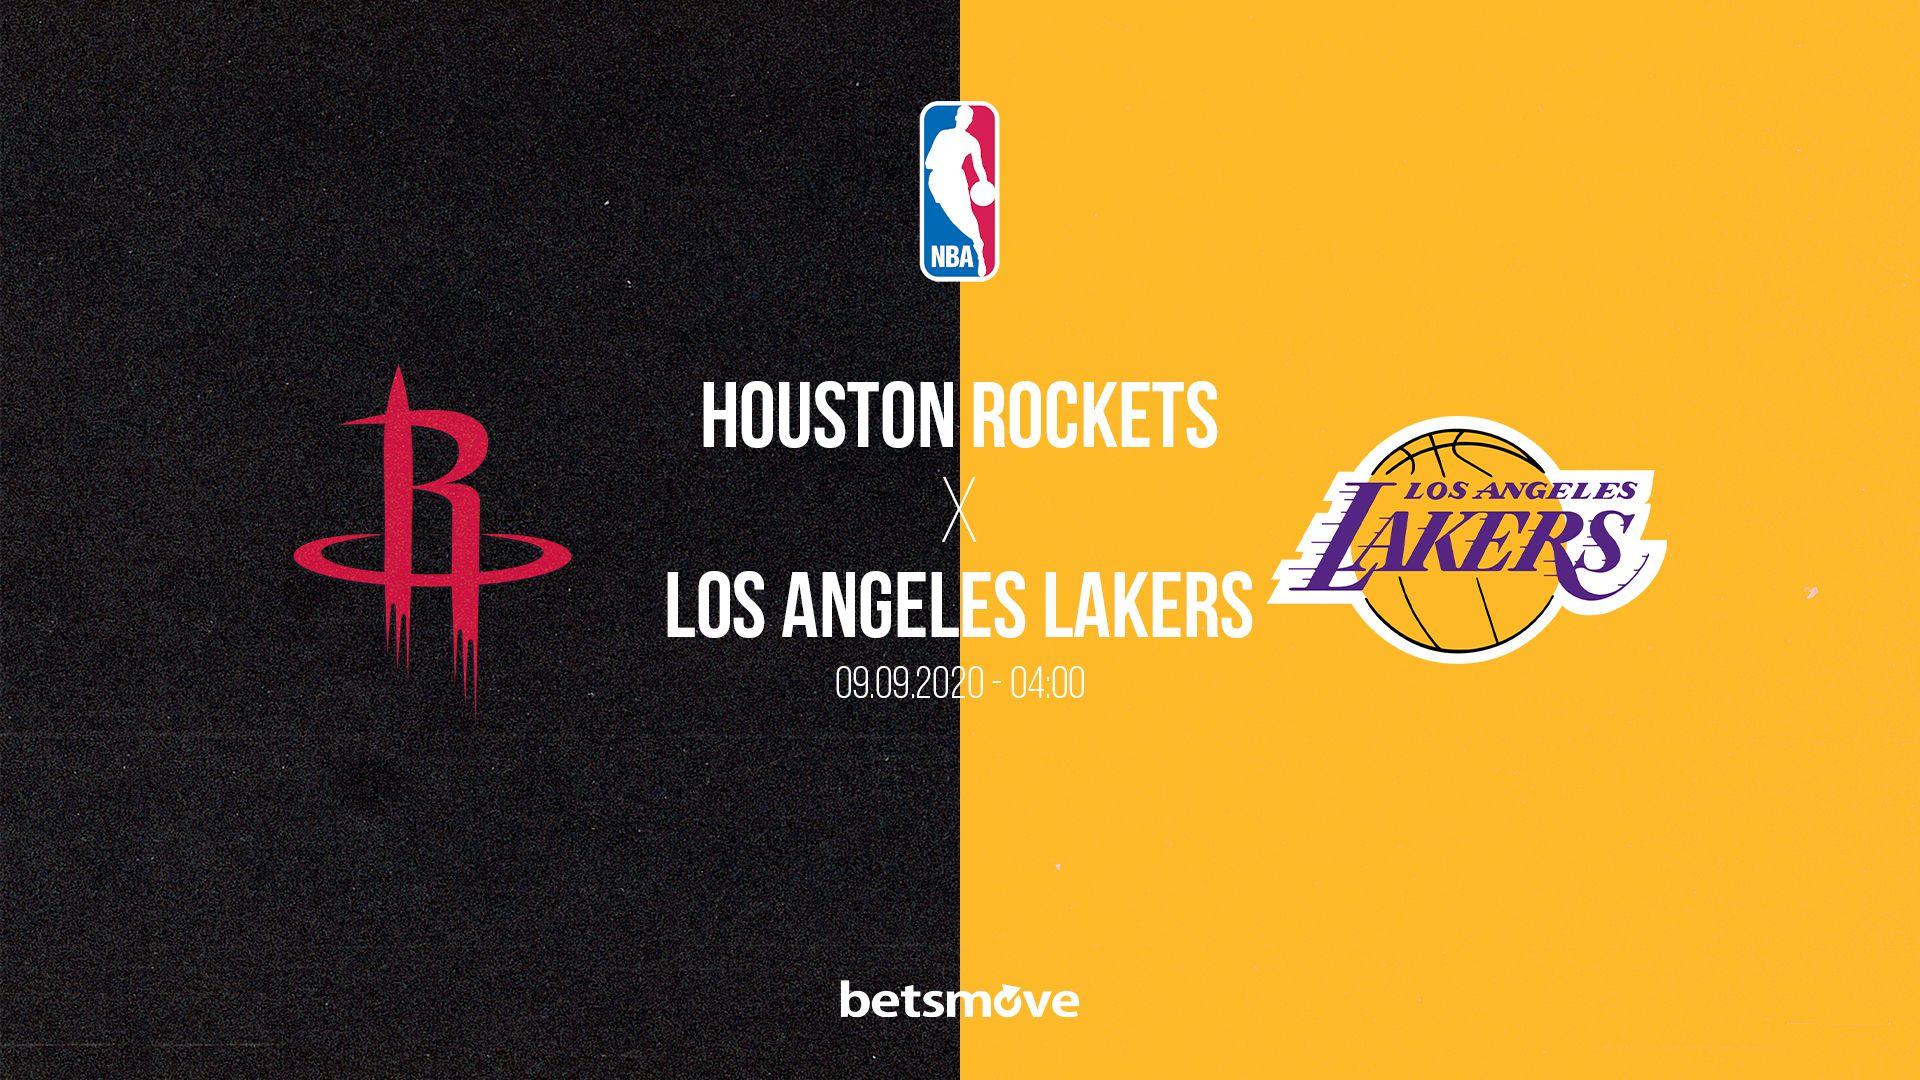 Houston Rockets Los Angeles Lakers Canli Izle 2020 Mac